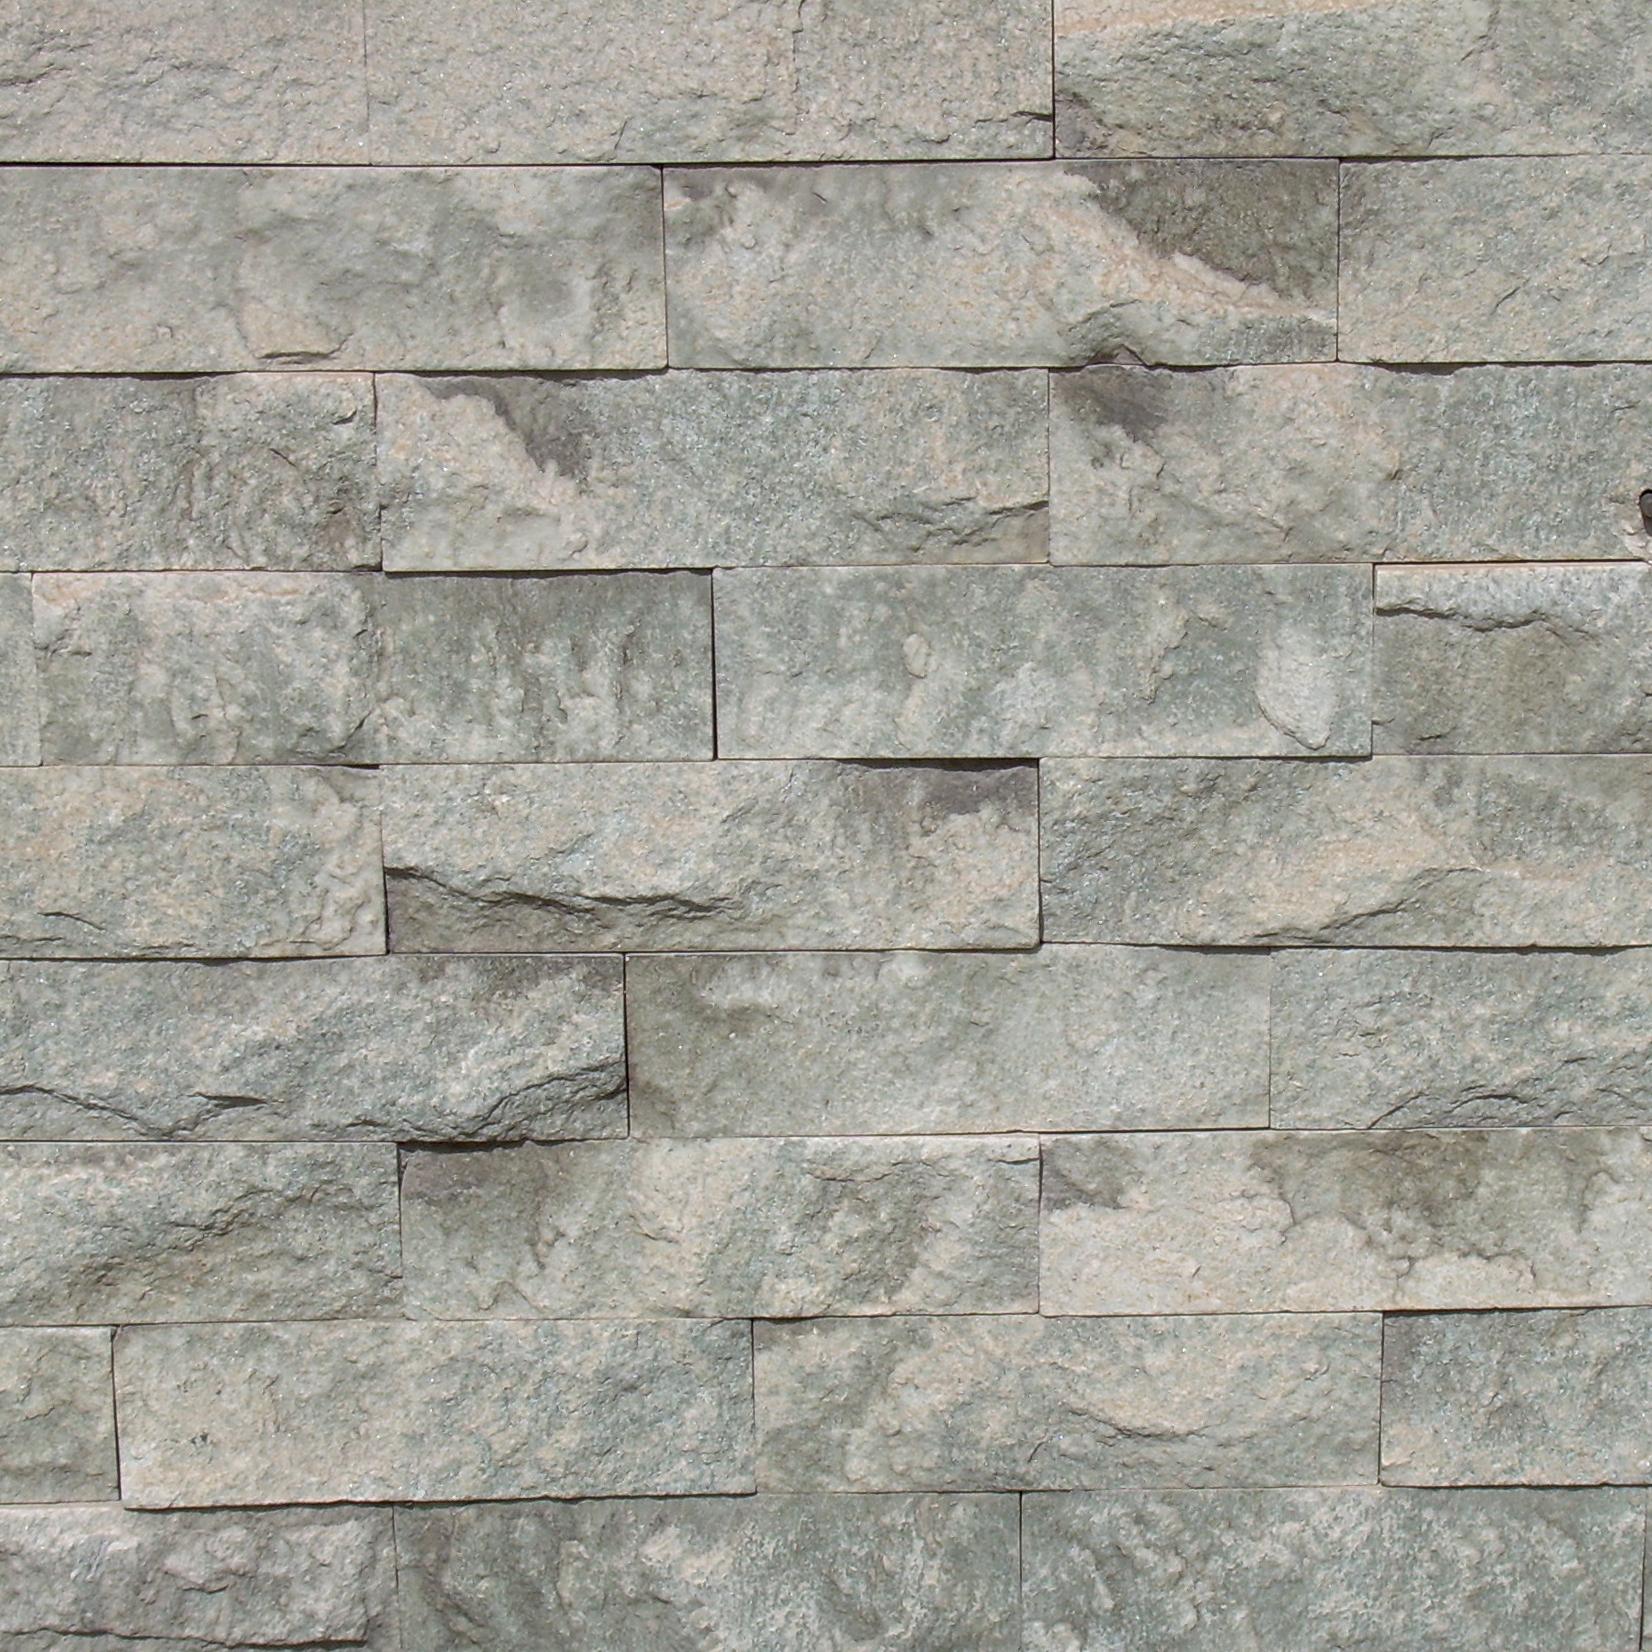 Textur wall brick